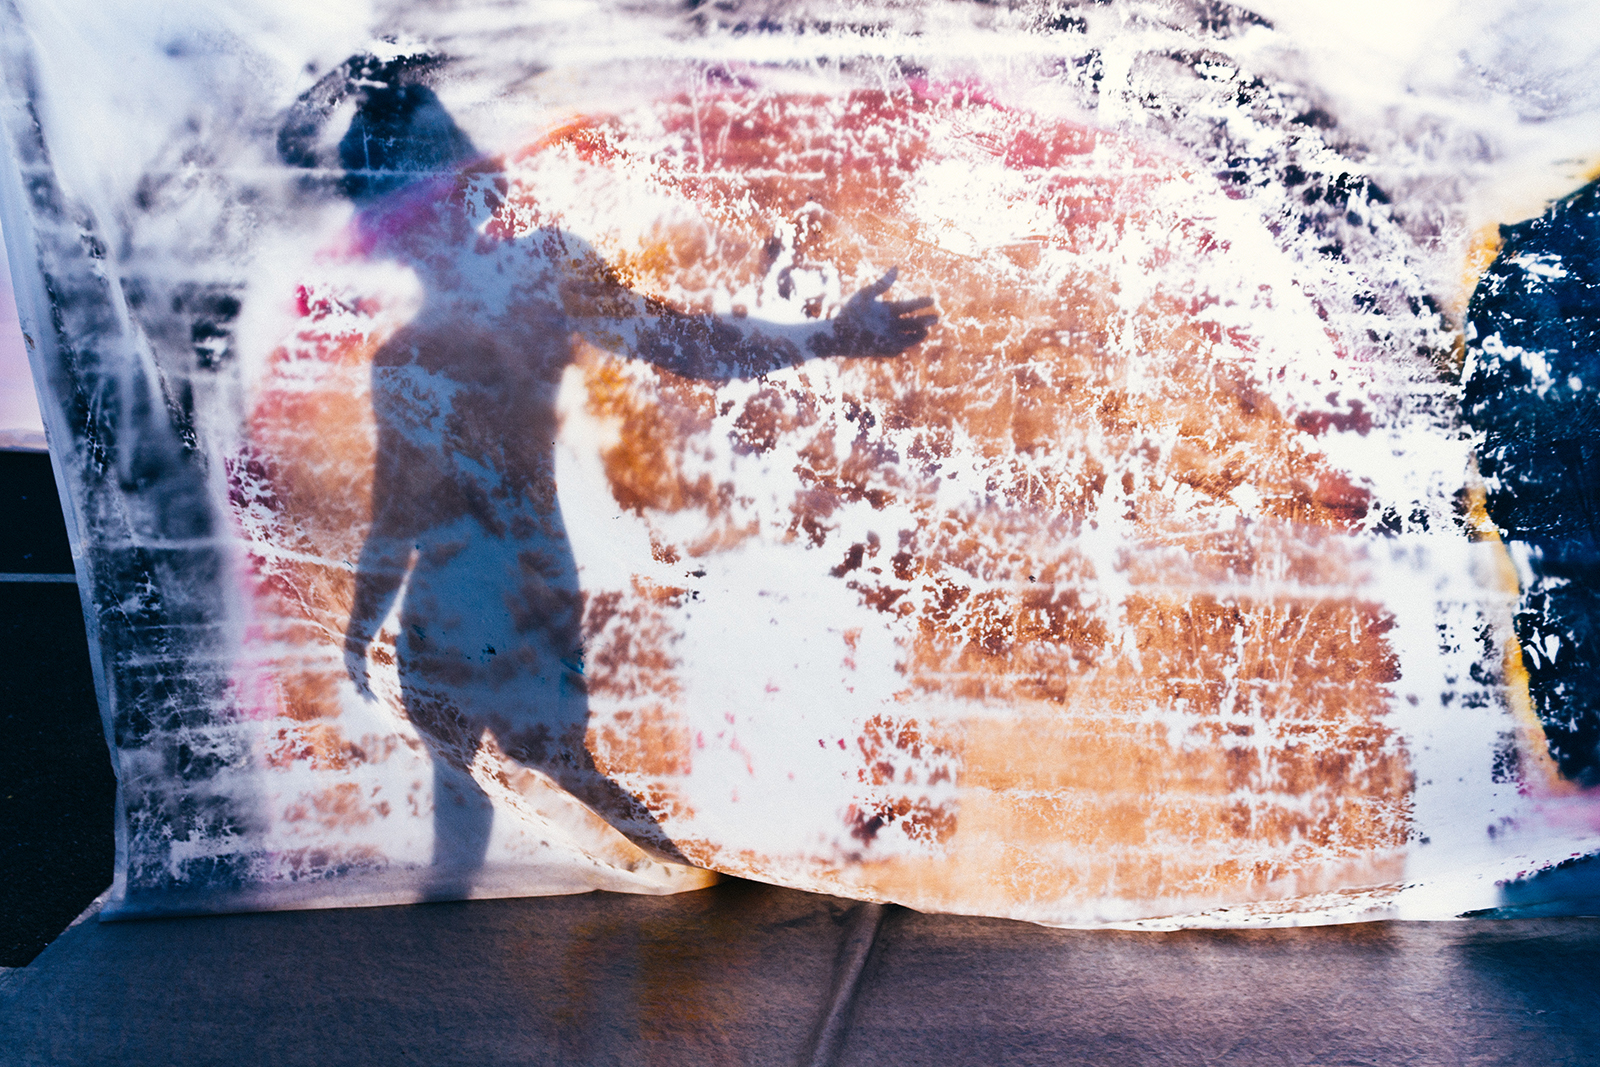 Saeio, Mercuriales bis, vu de l'installation, Les ateliers Wonder/Liebert ©Mathis D'Angelo